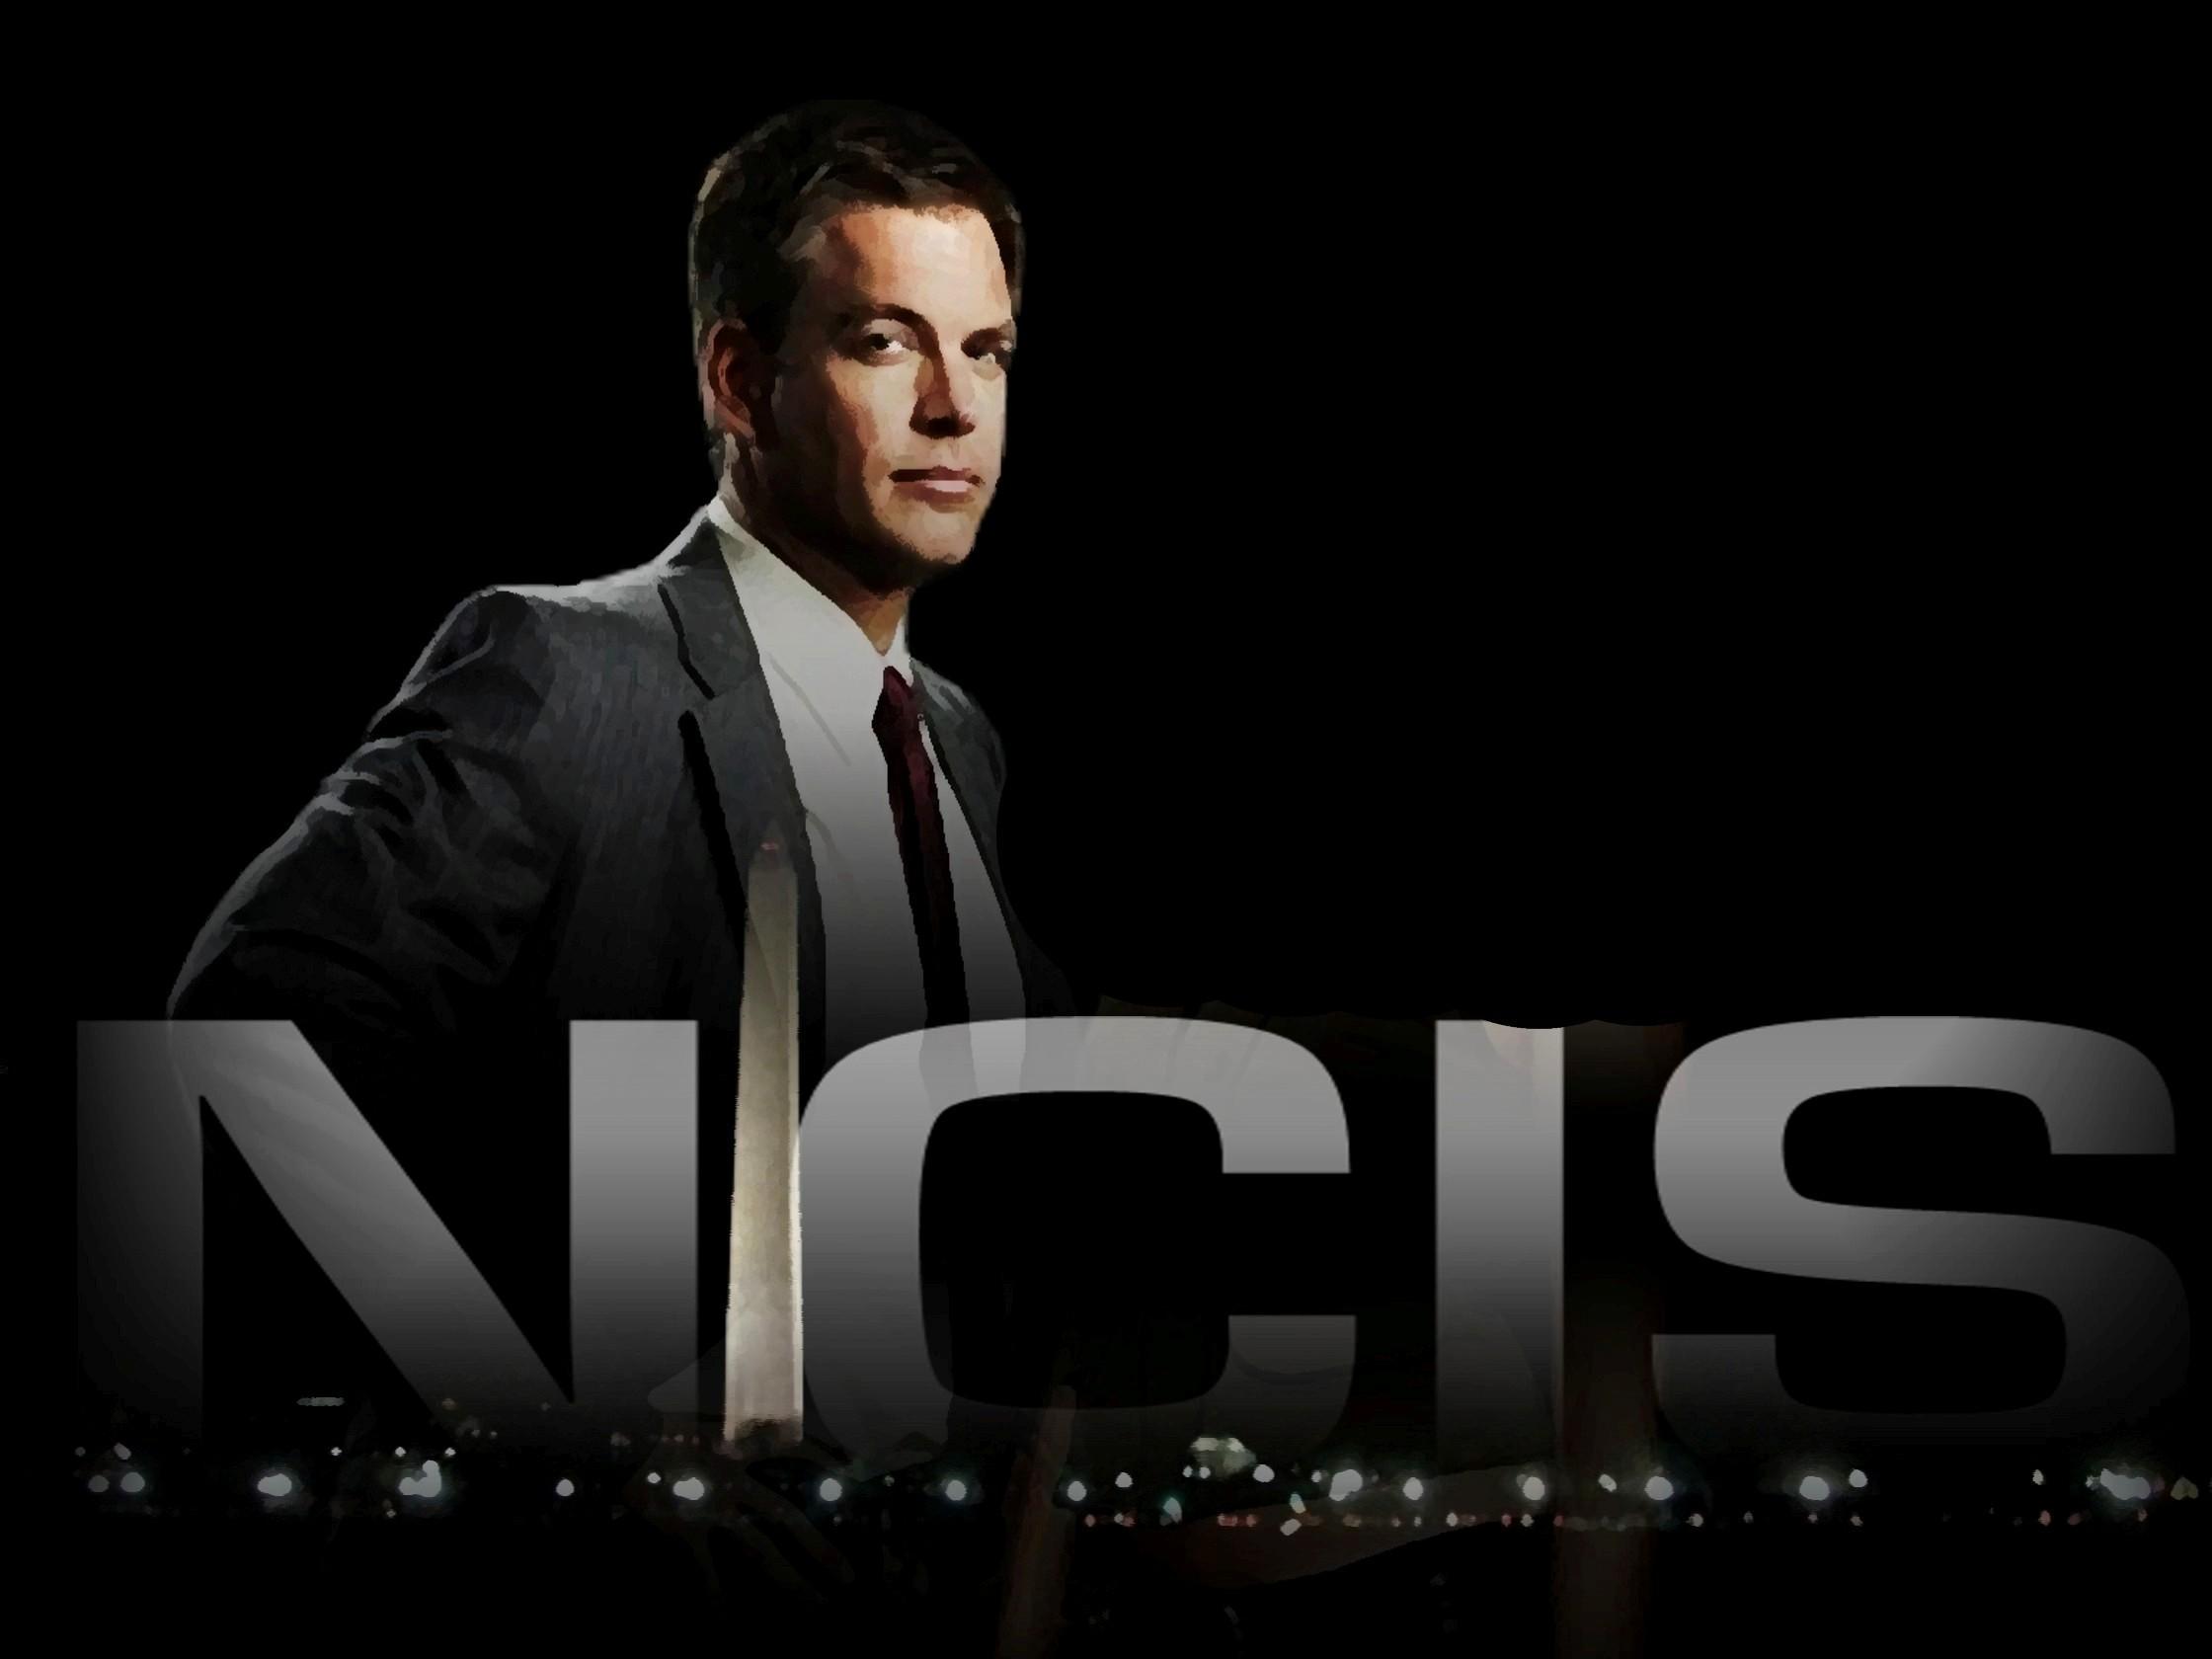 Michael NCIS - Unità anticrimine